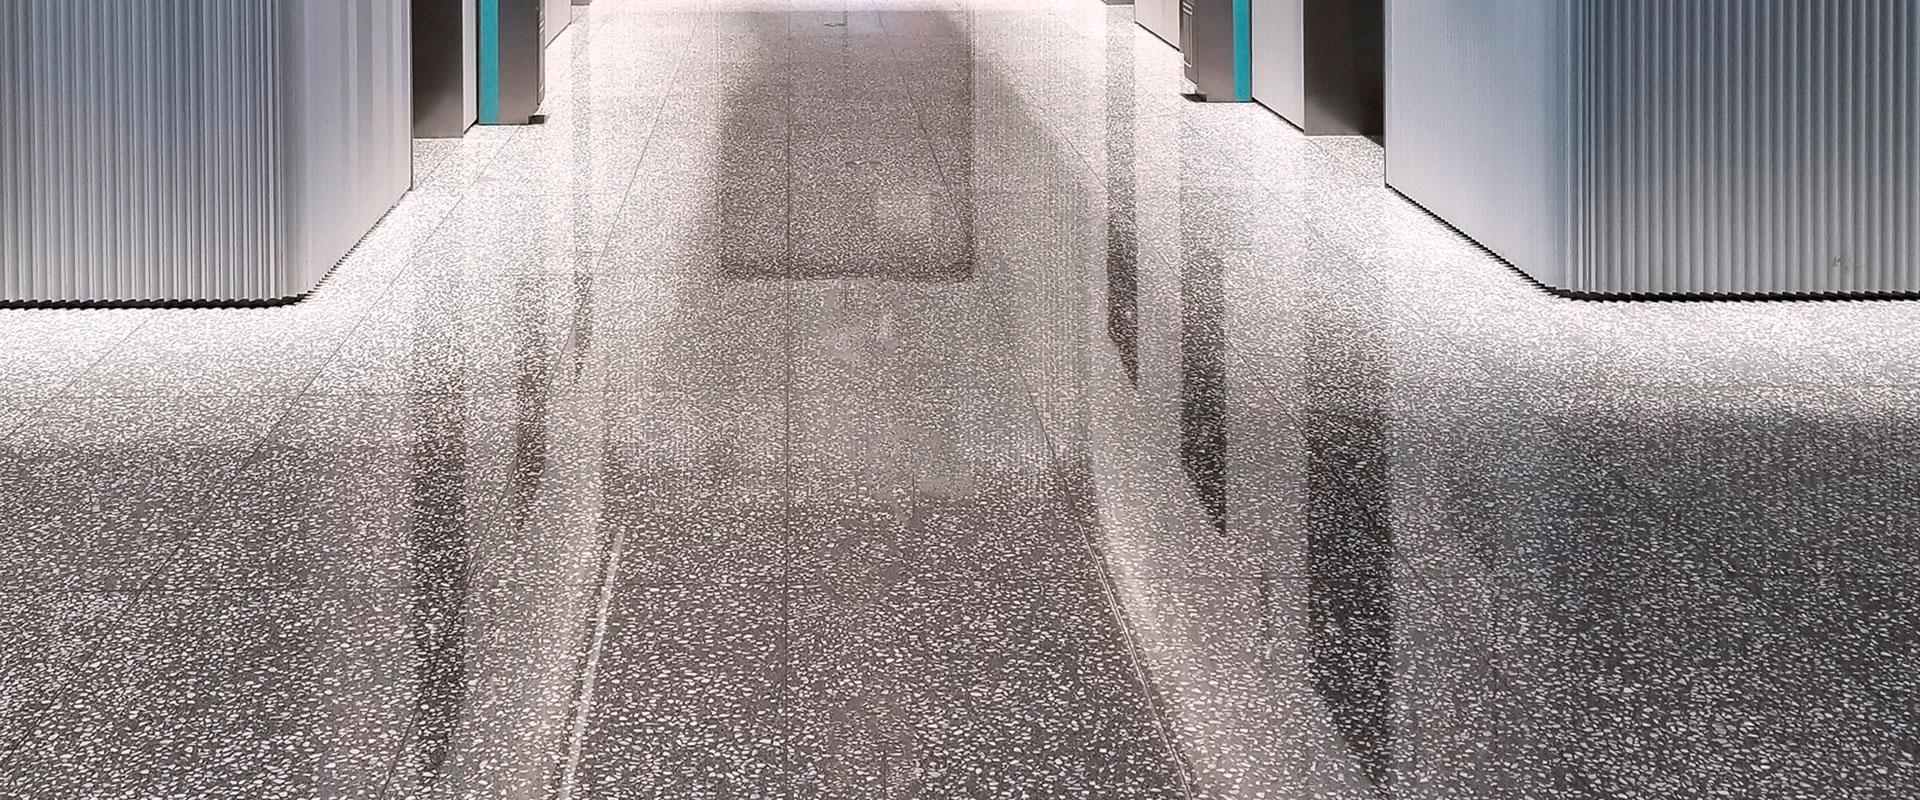 AGGLOTECH-progetto-mall-mixc-crcity-slider-3